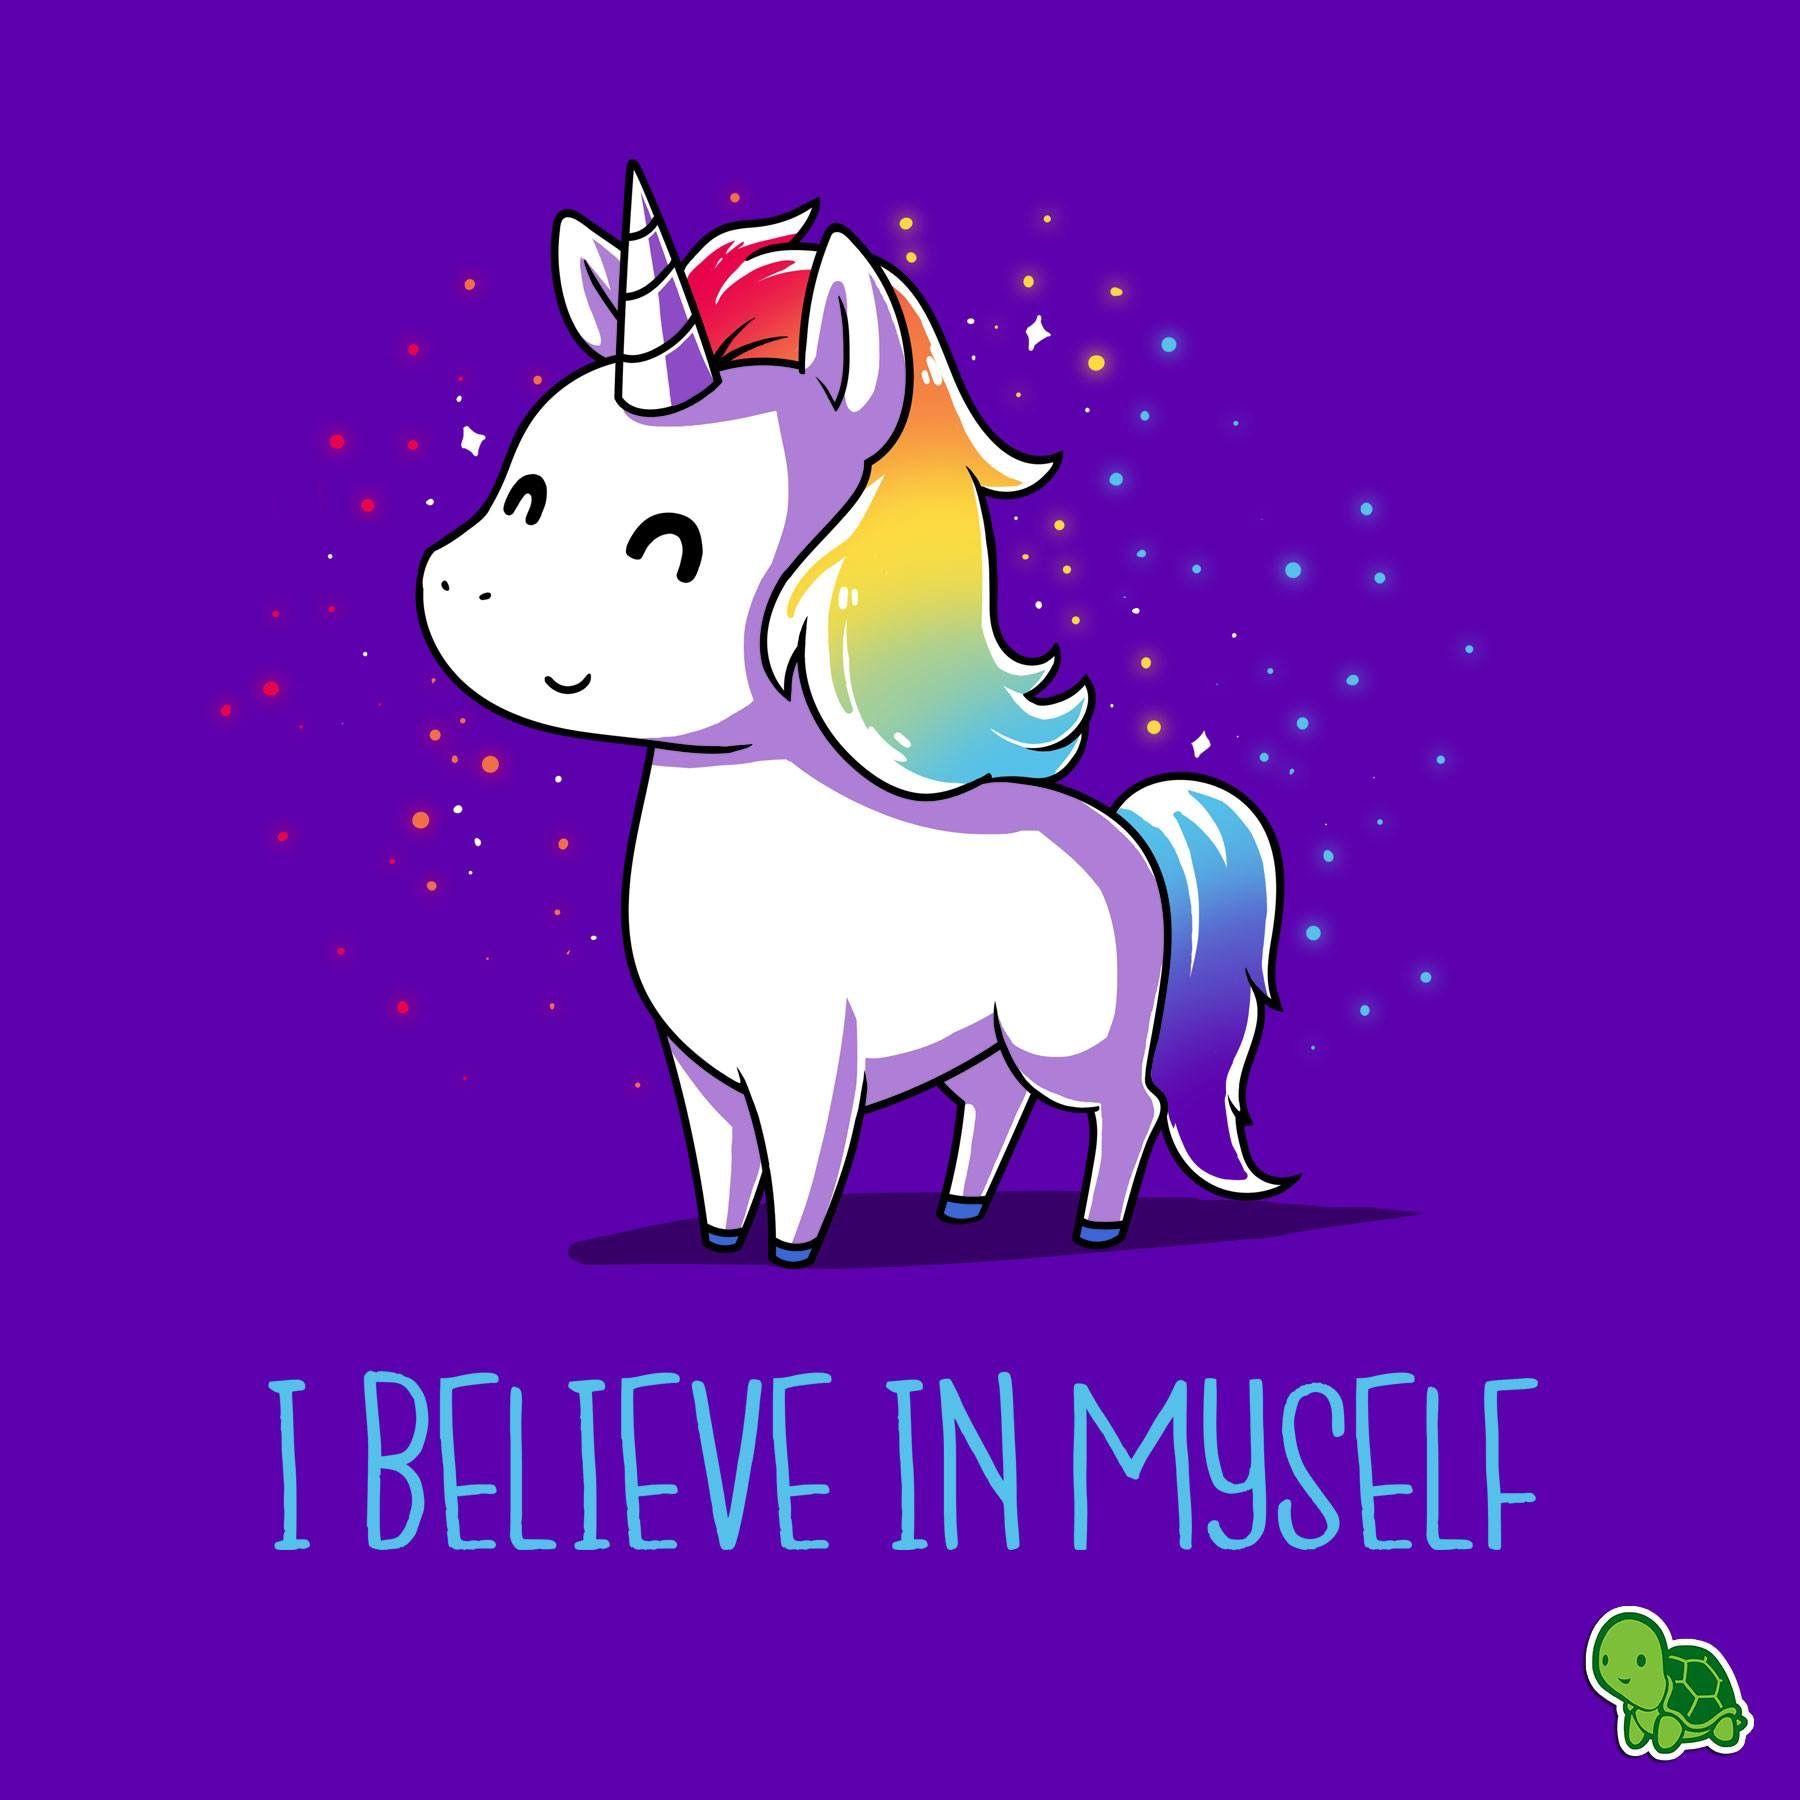 Pin By Cristina Marie Jones On So Me Unicorn Quotes Unicorn Pictures Unicorn